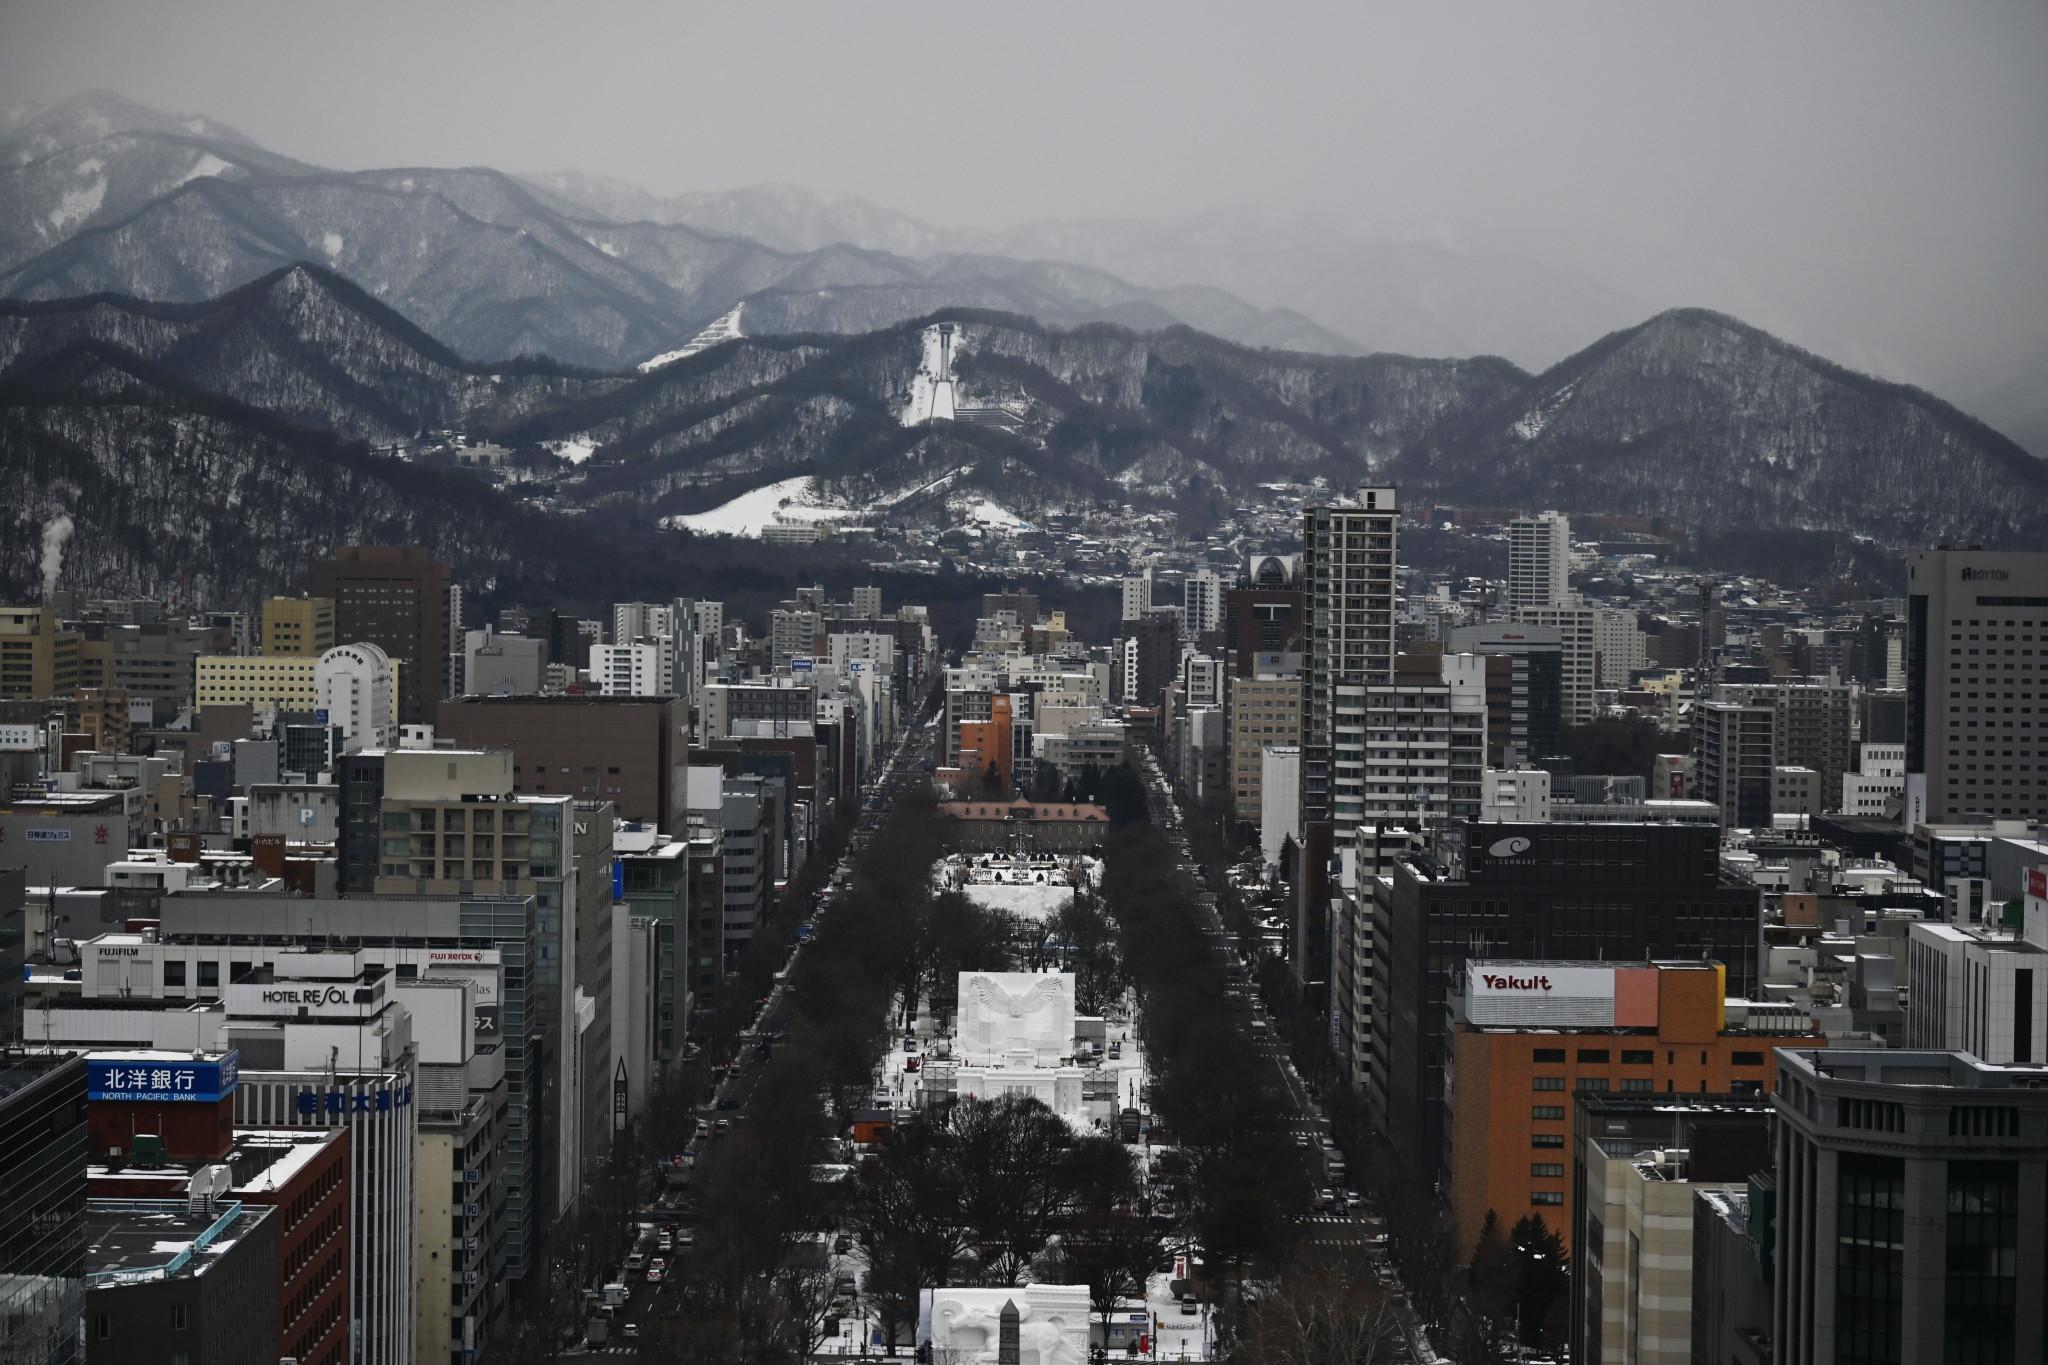 Tokyo 2020 marathon test event in Sapporo scheduled for May